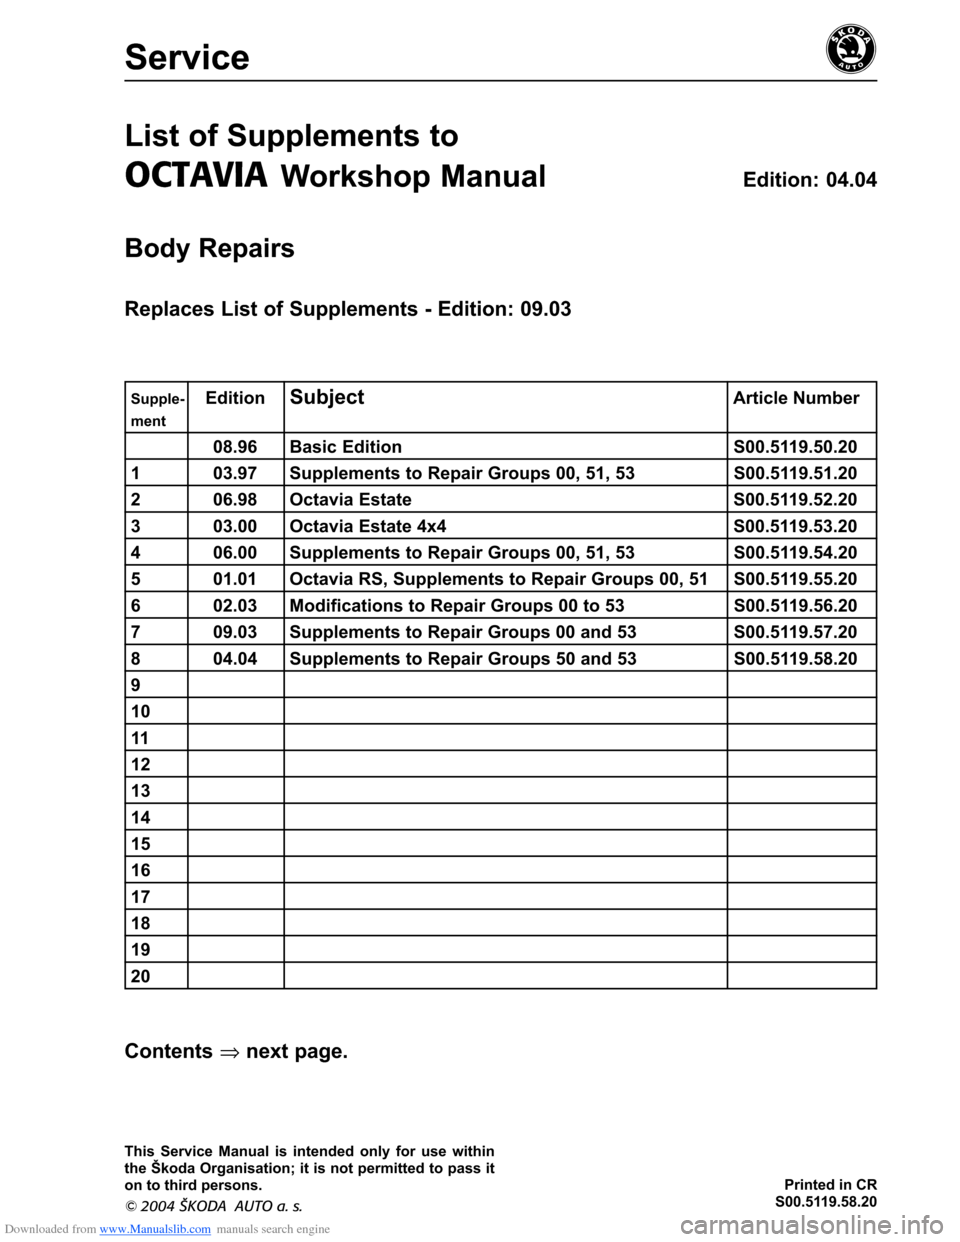 Skoda Octavia 1u repair manual code